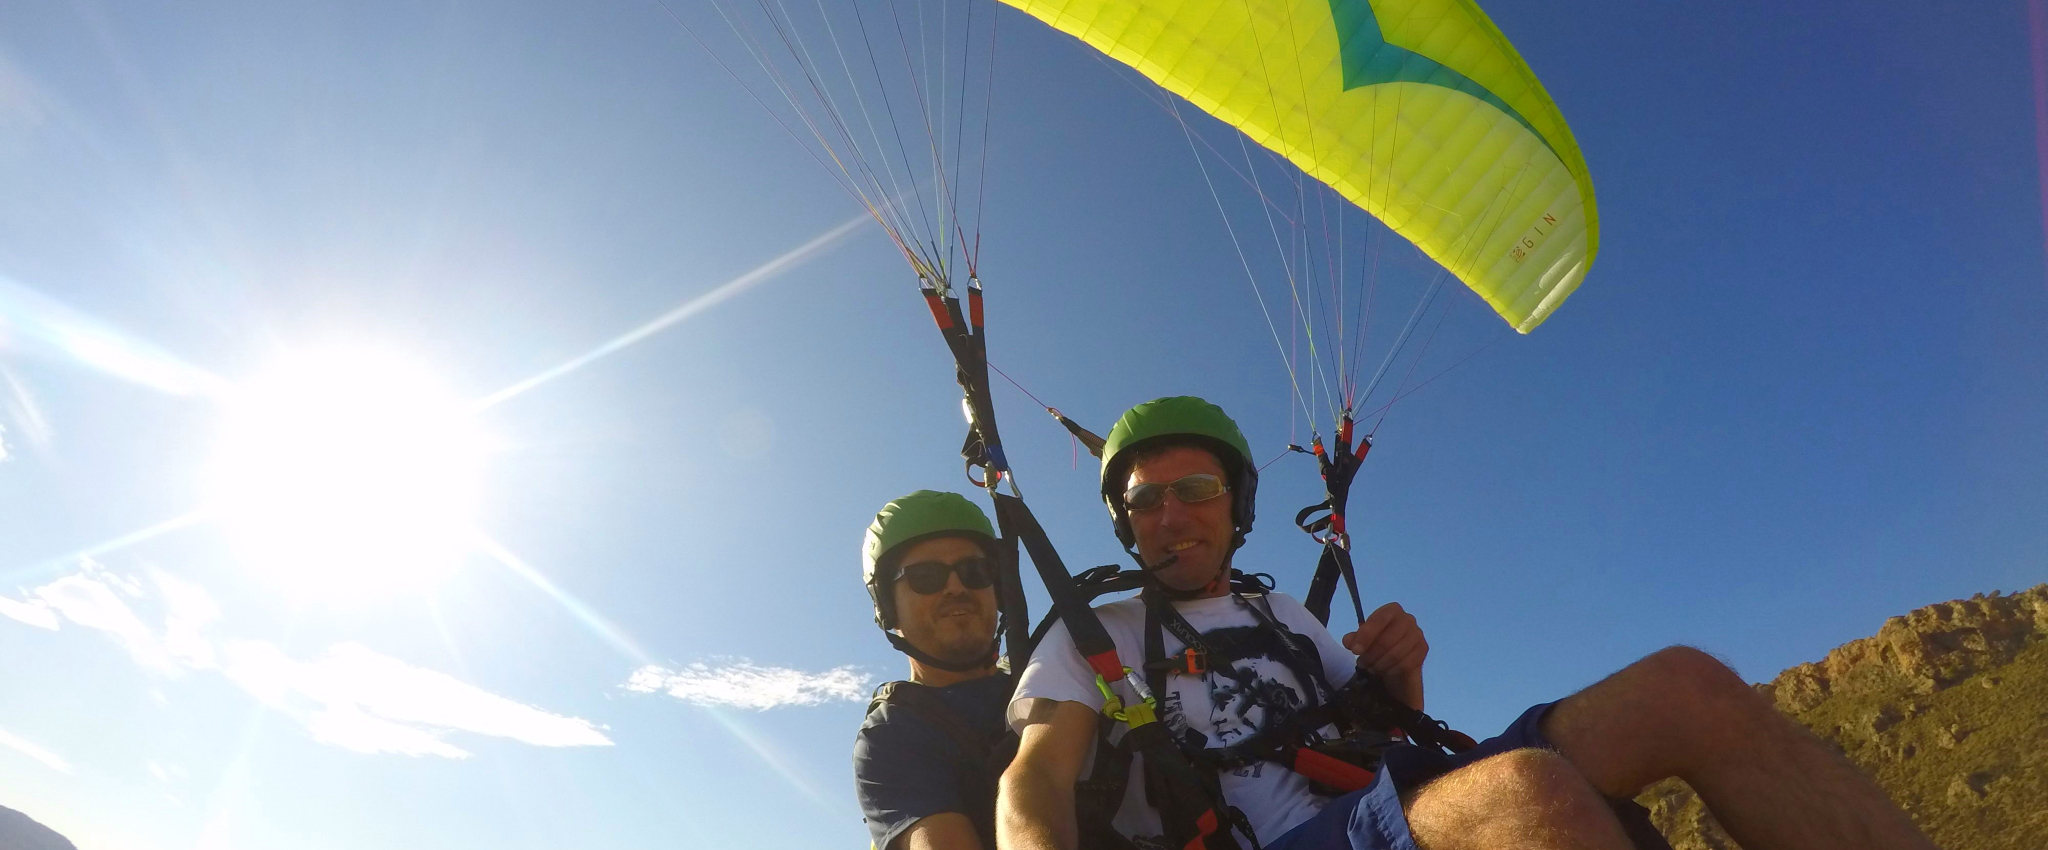 Paragliding Benidorm Costa Blanca